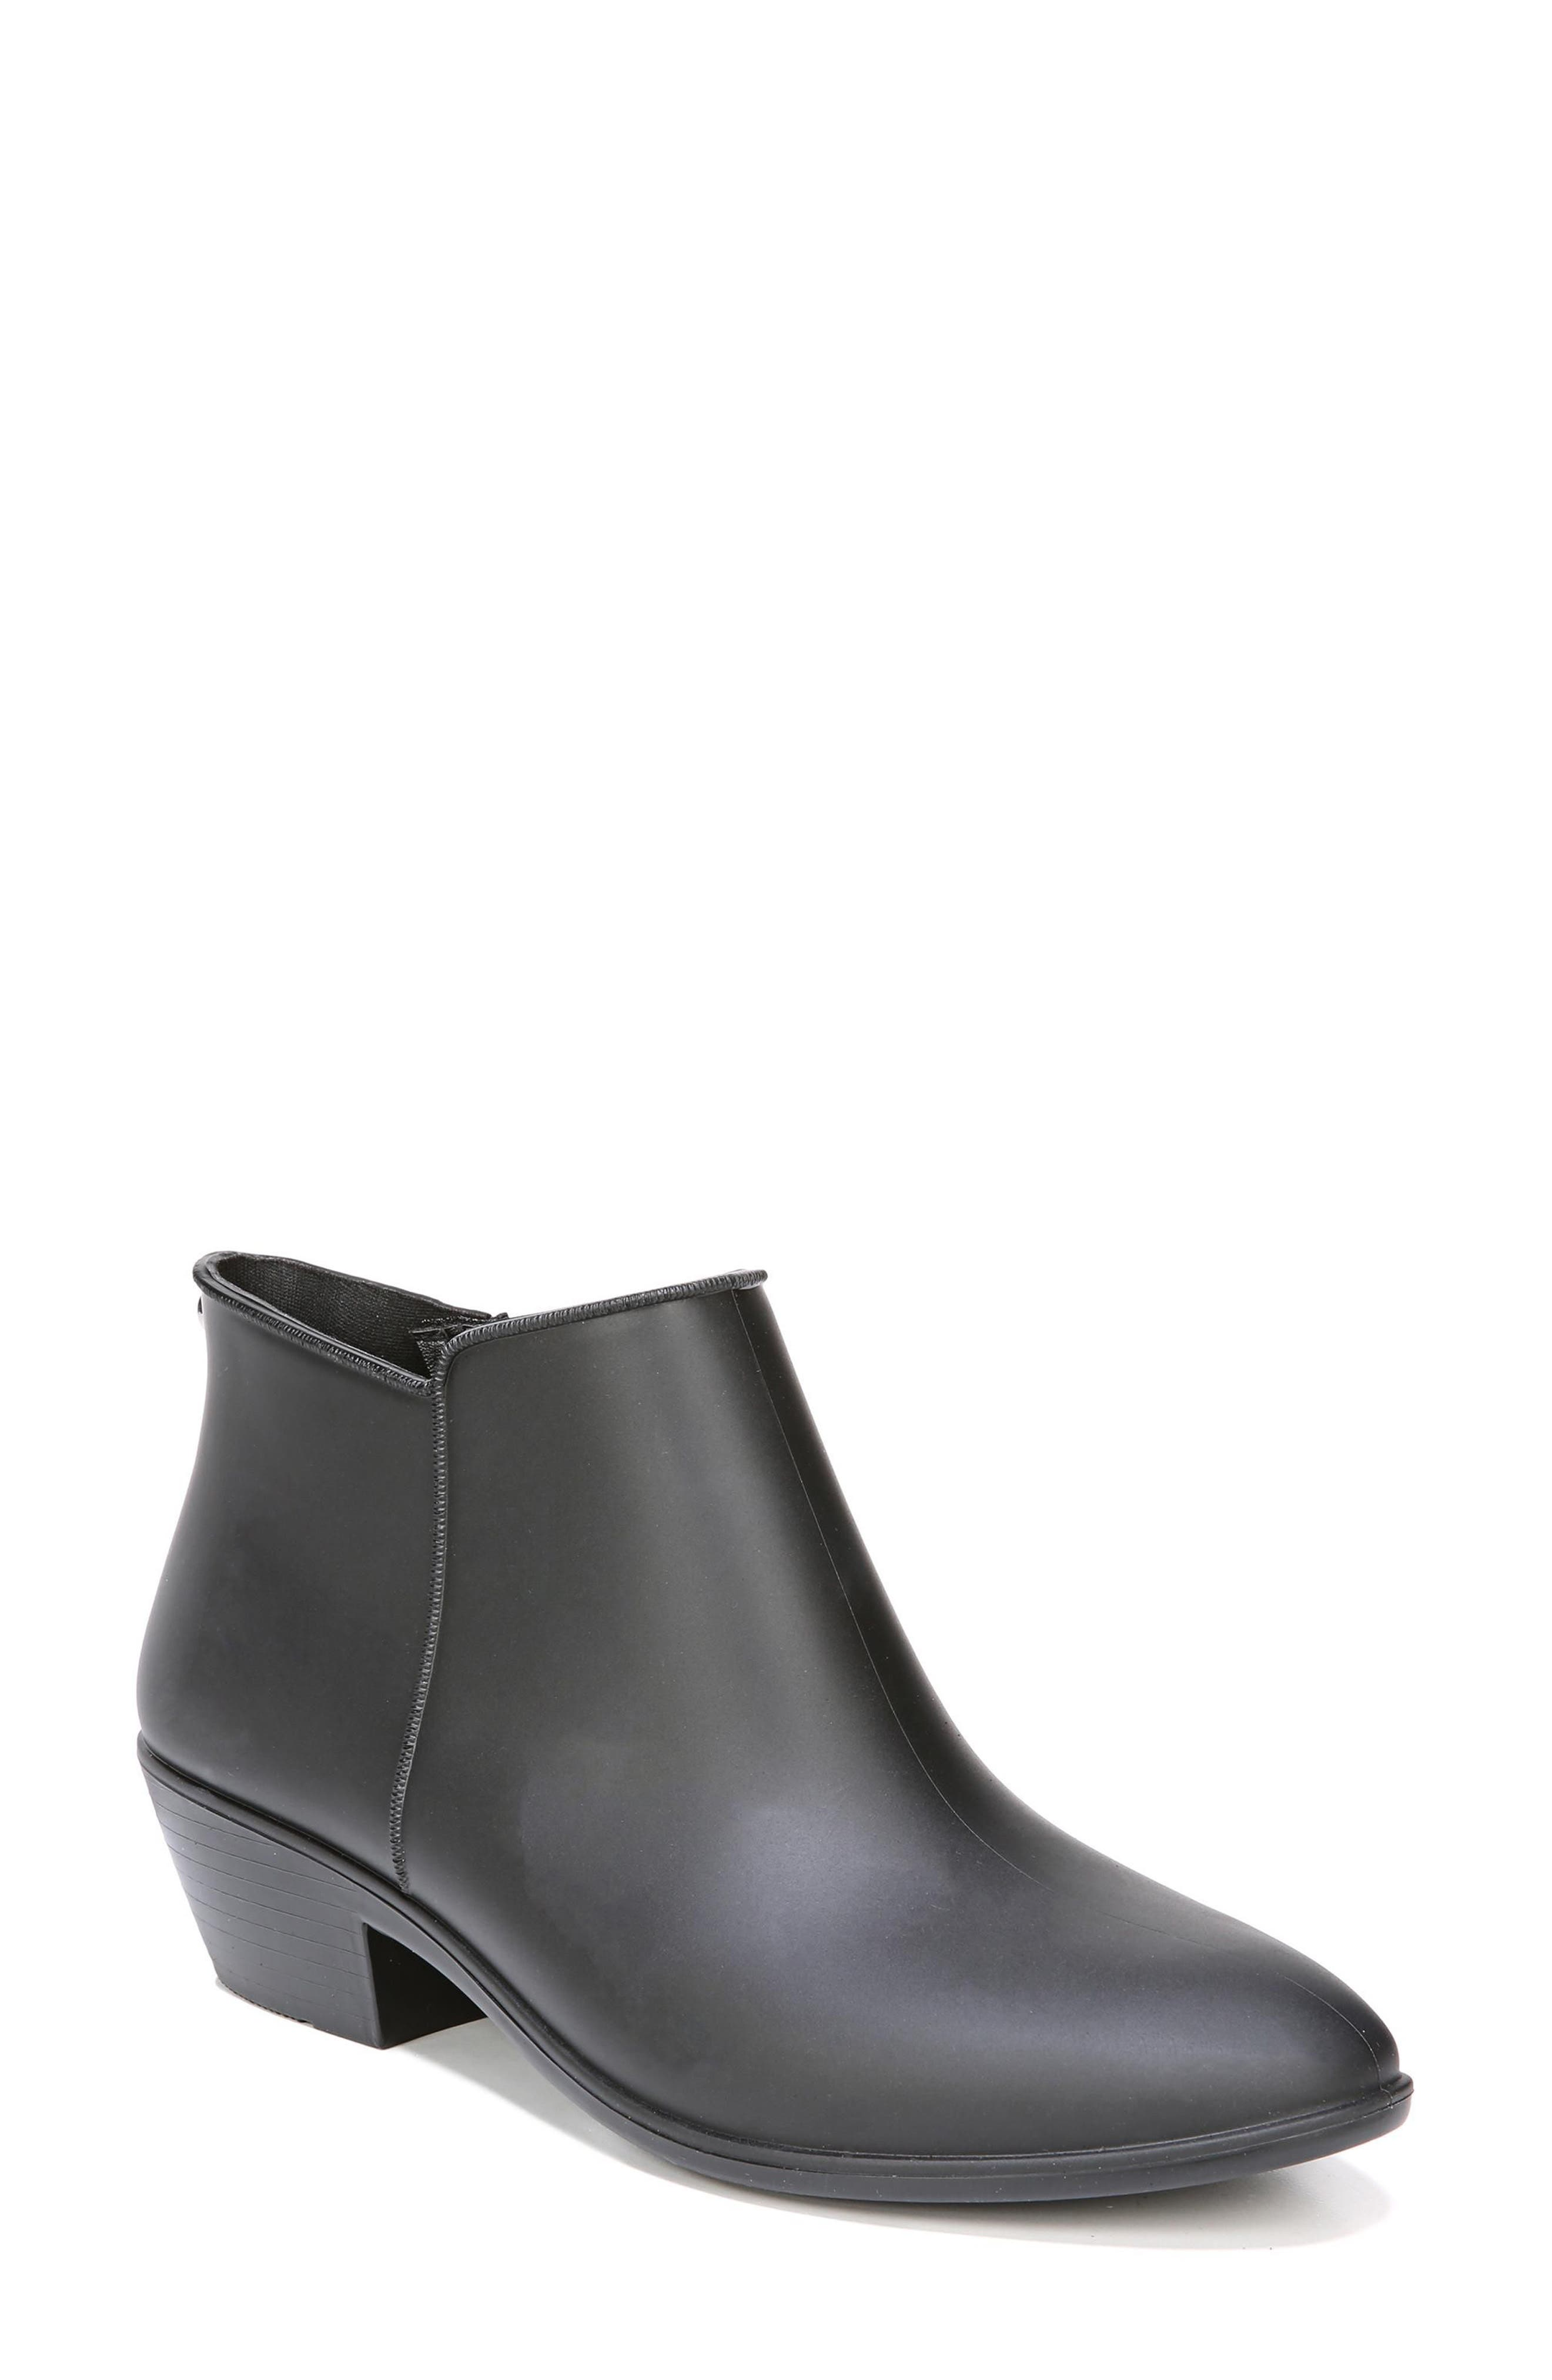 Alternate Image 1 Selected - Sam Edelman Petty Rain Boot (Women)